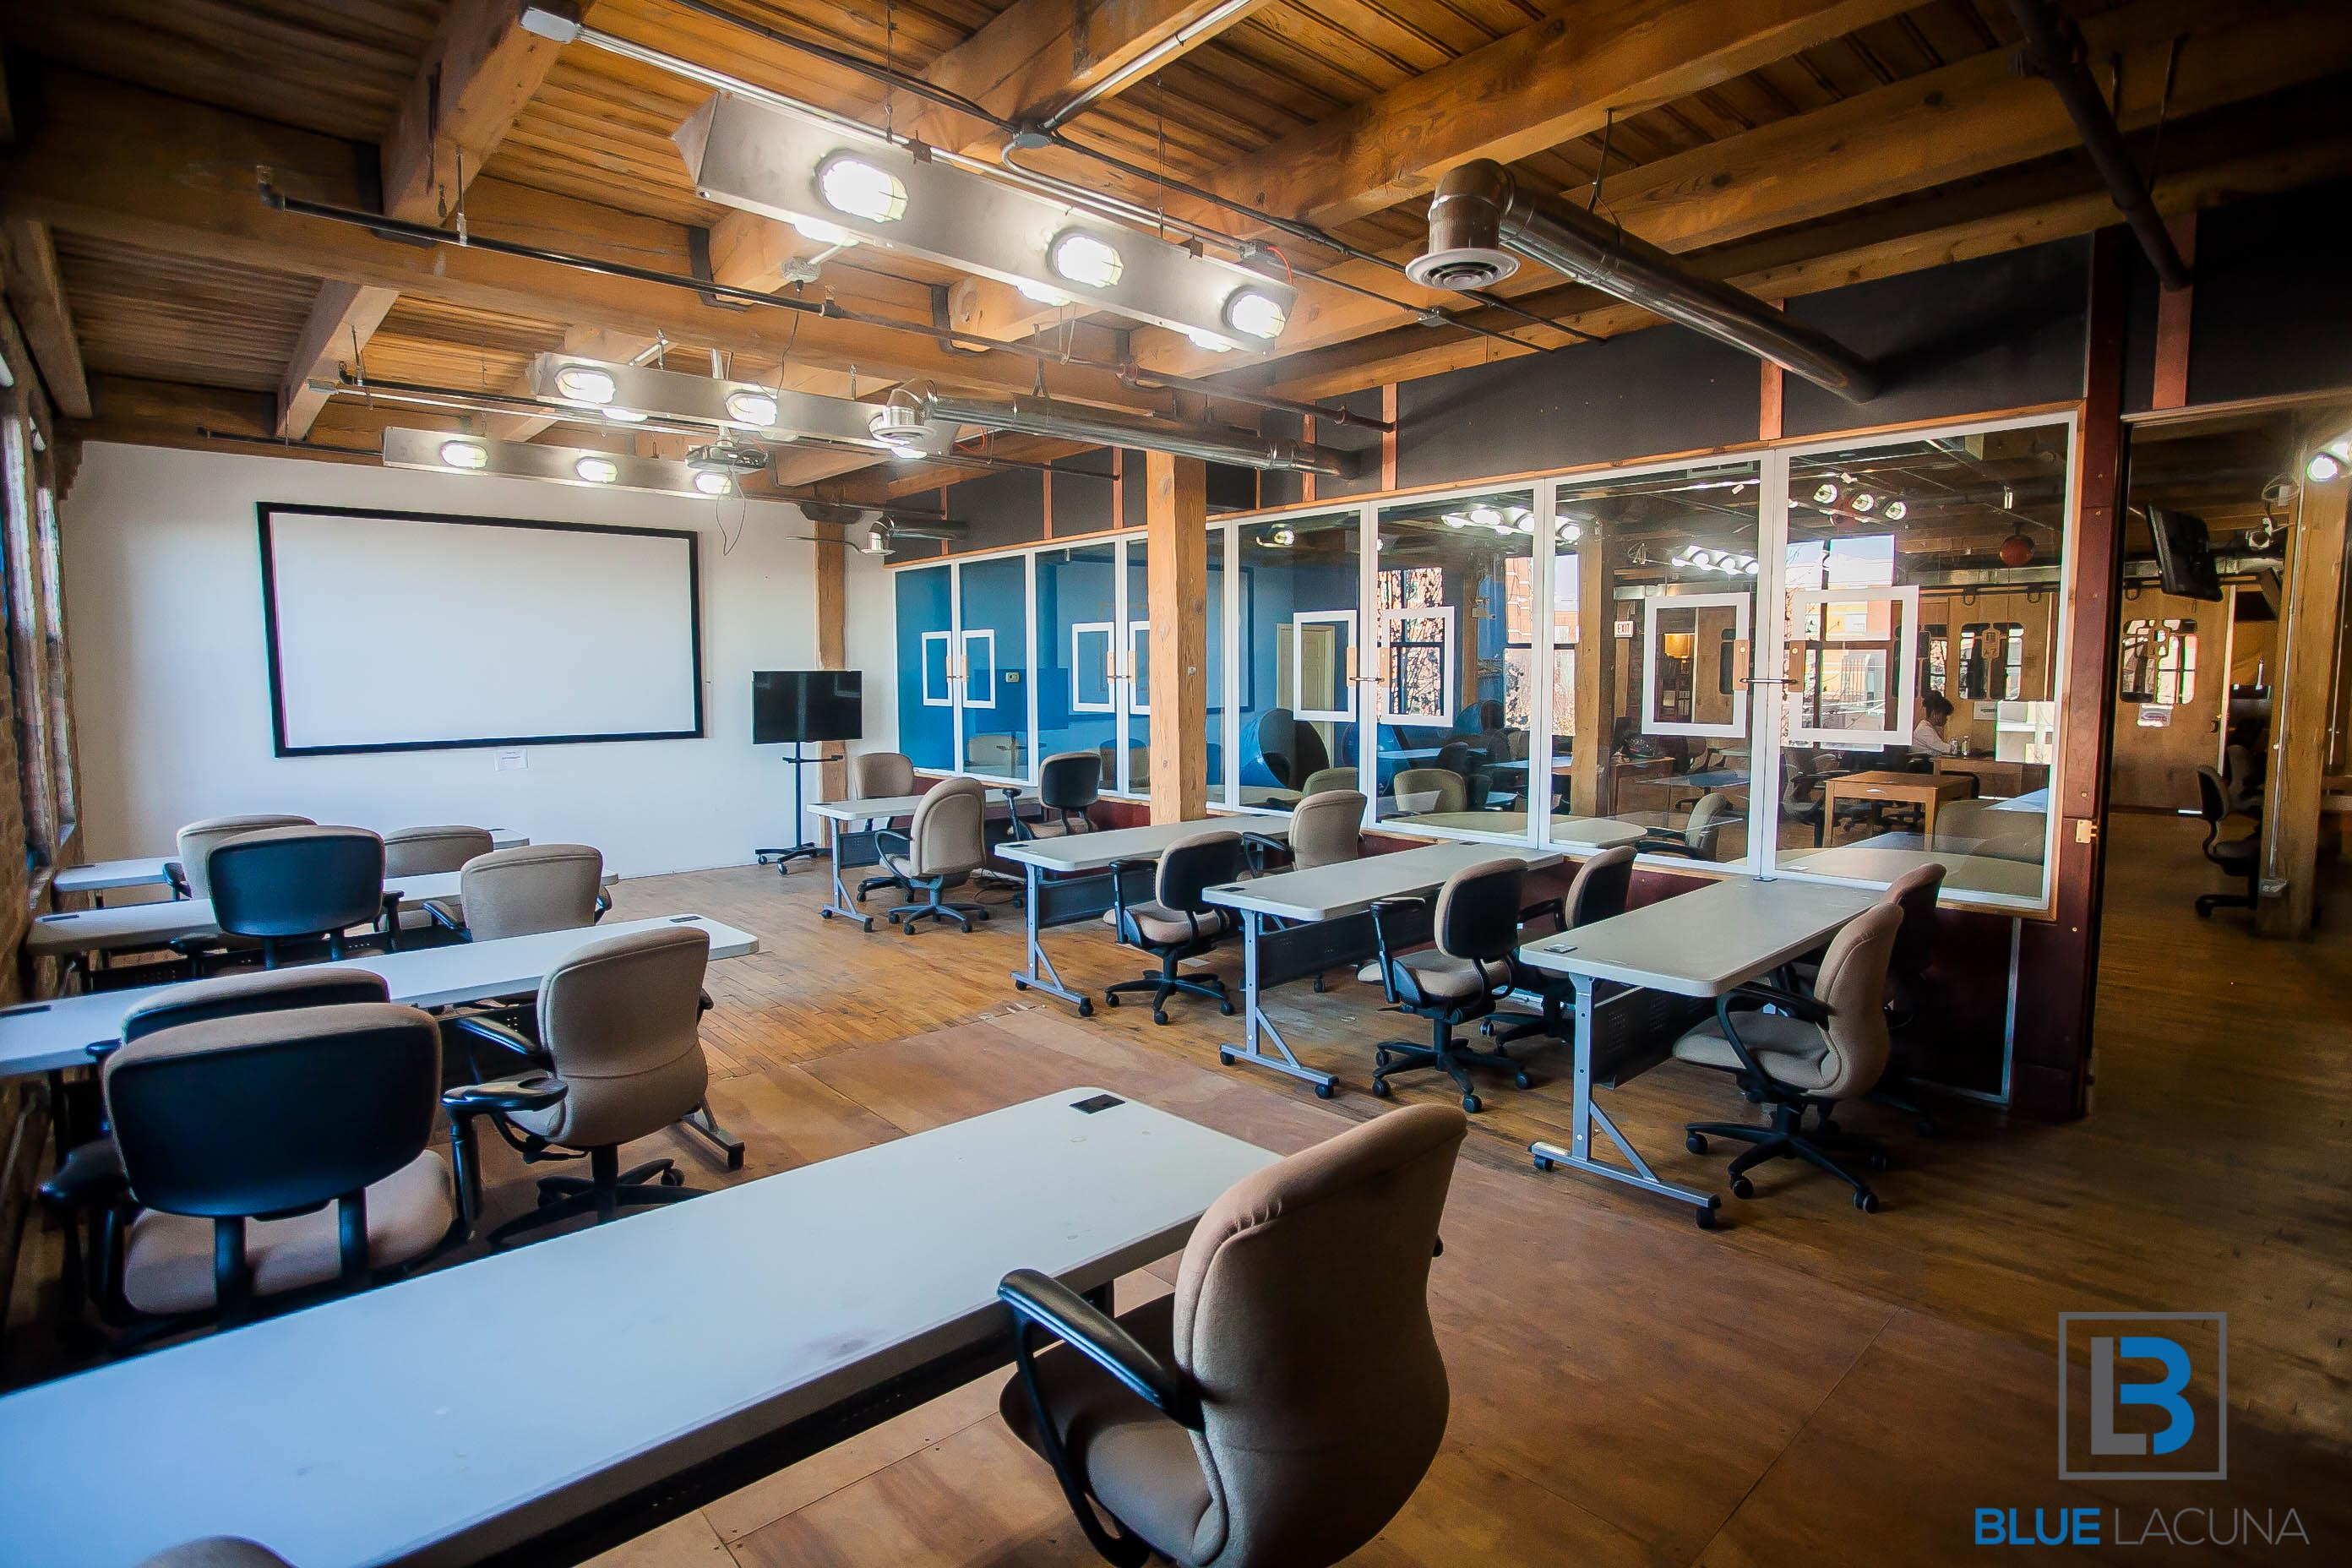 Blue Lacuna - Banneker Classroom